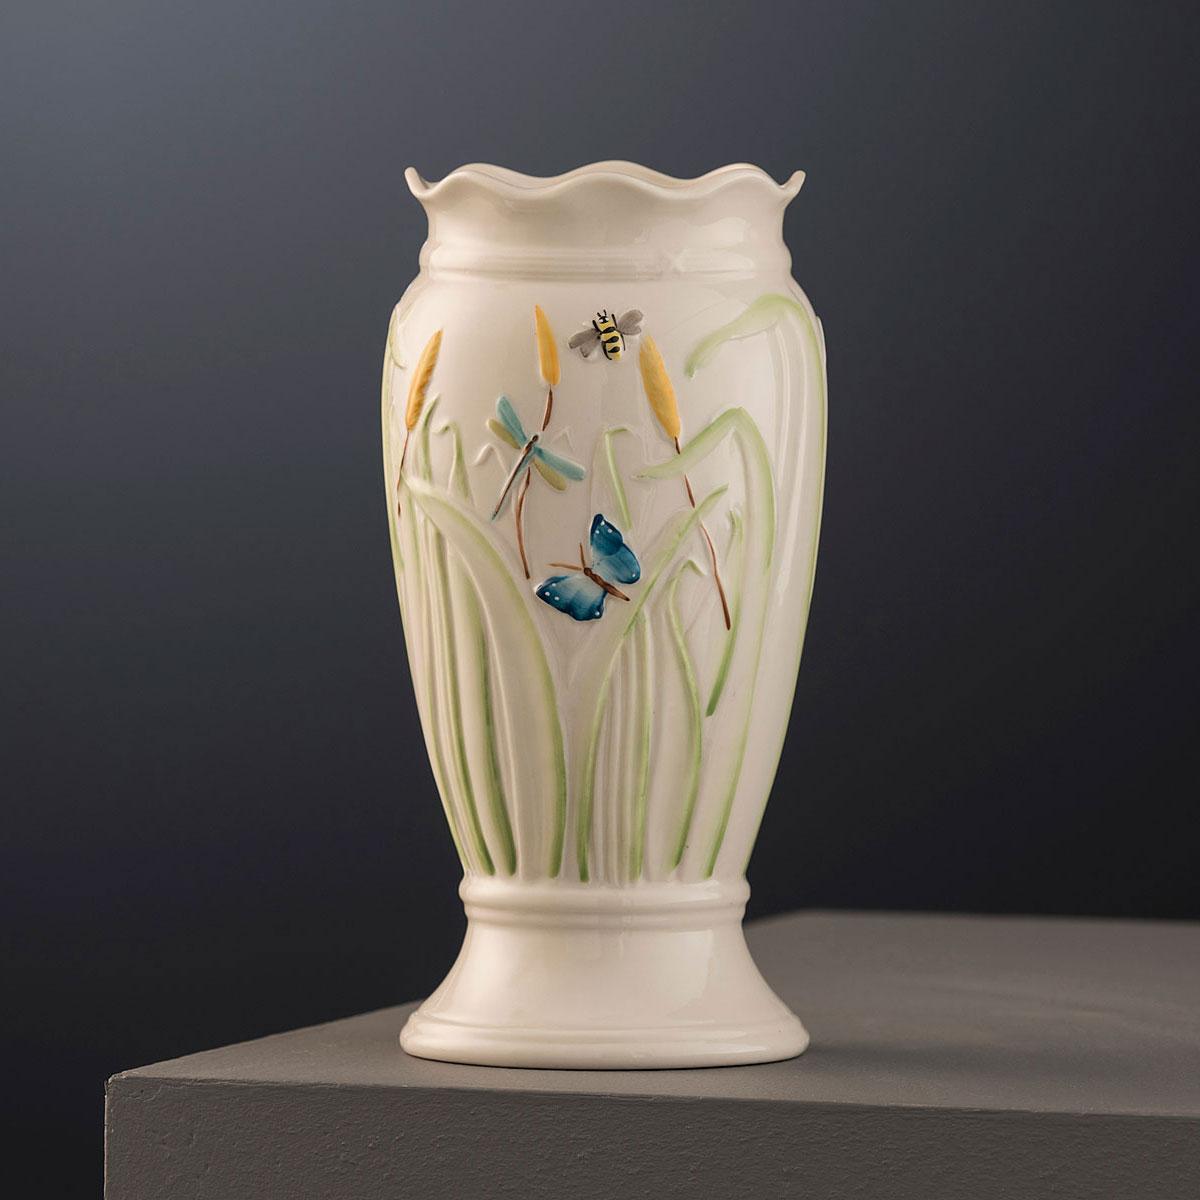 Belleek Masterpiece Vase Limited Edition